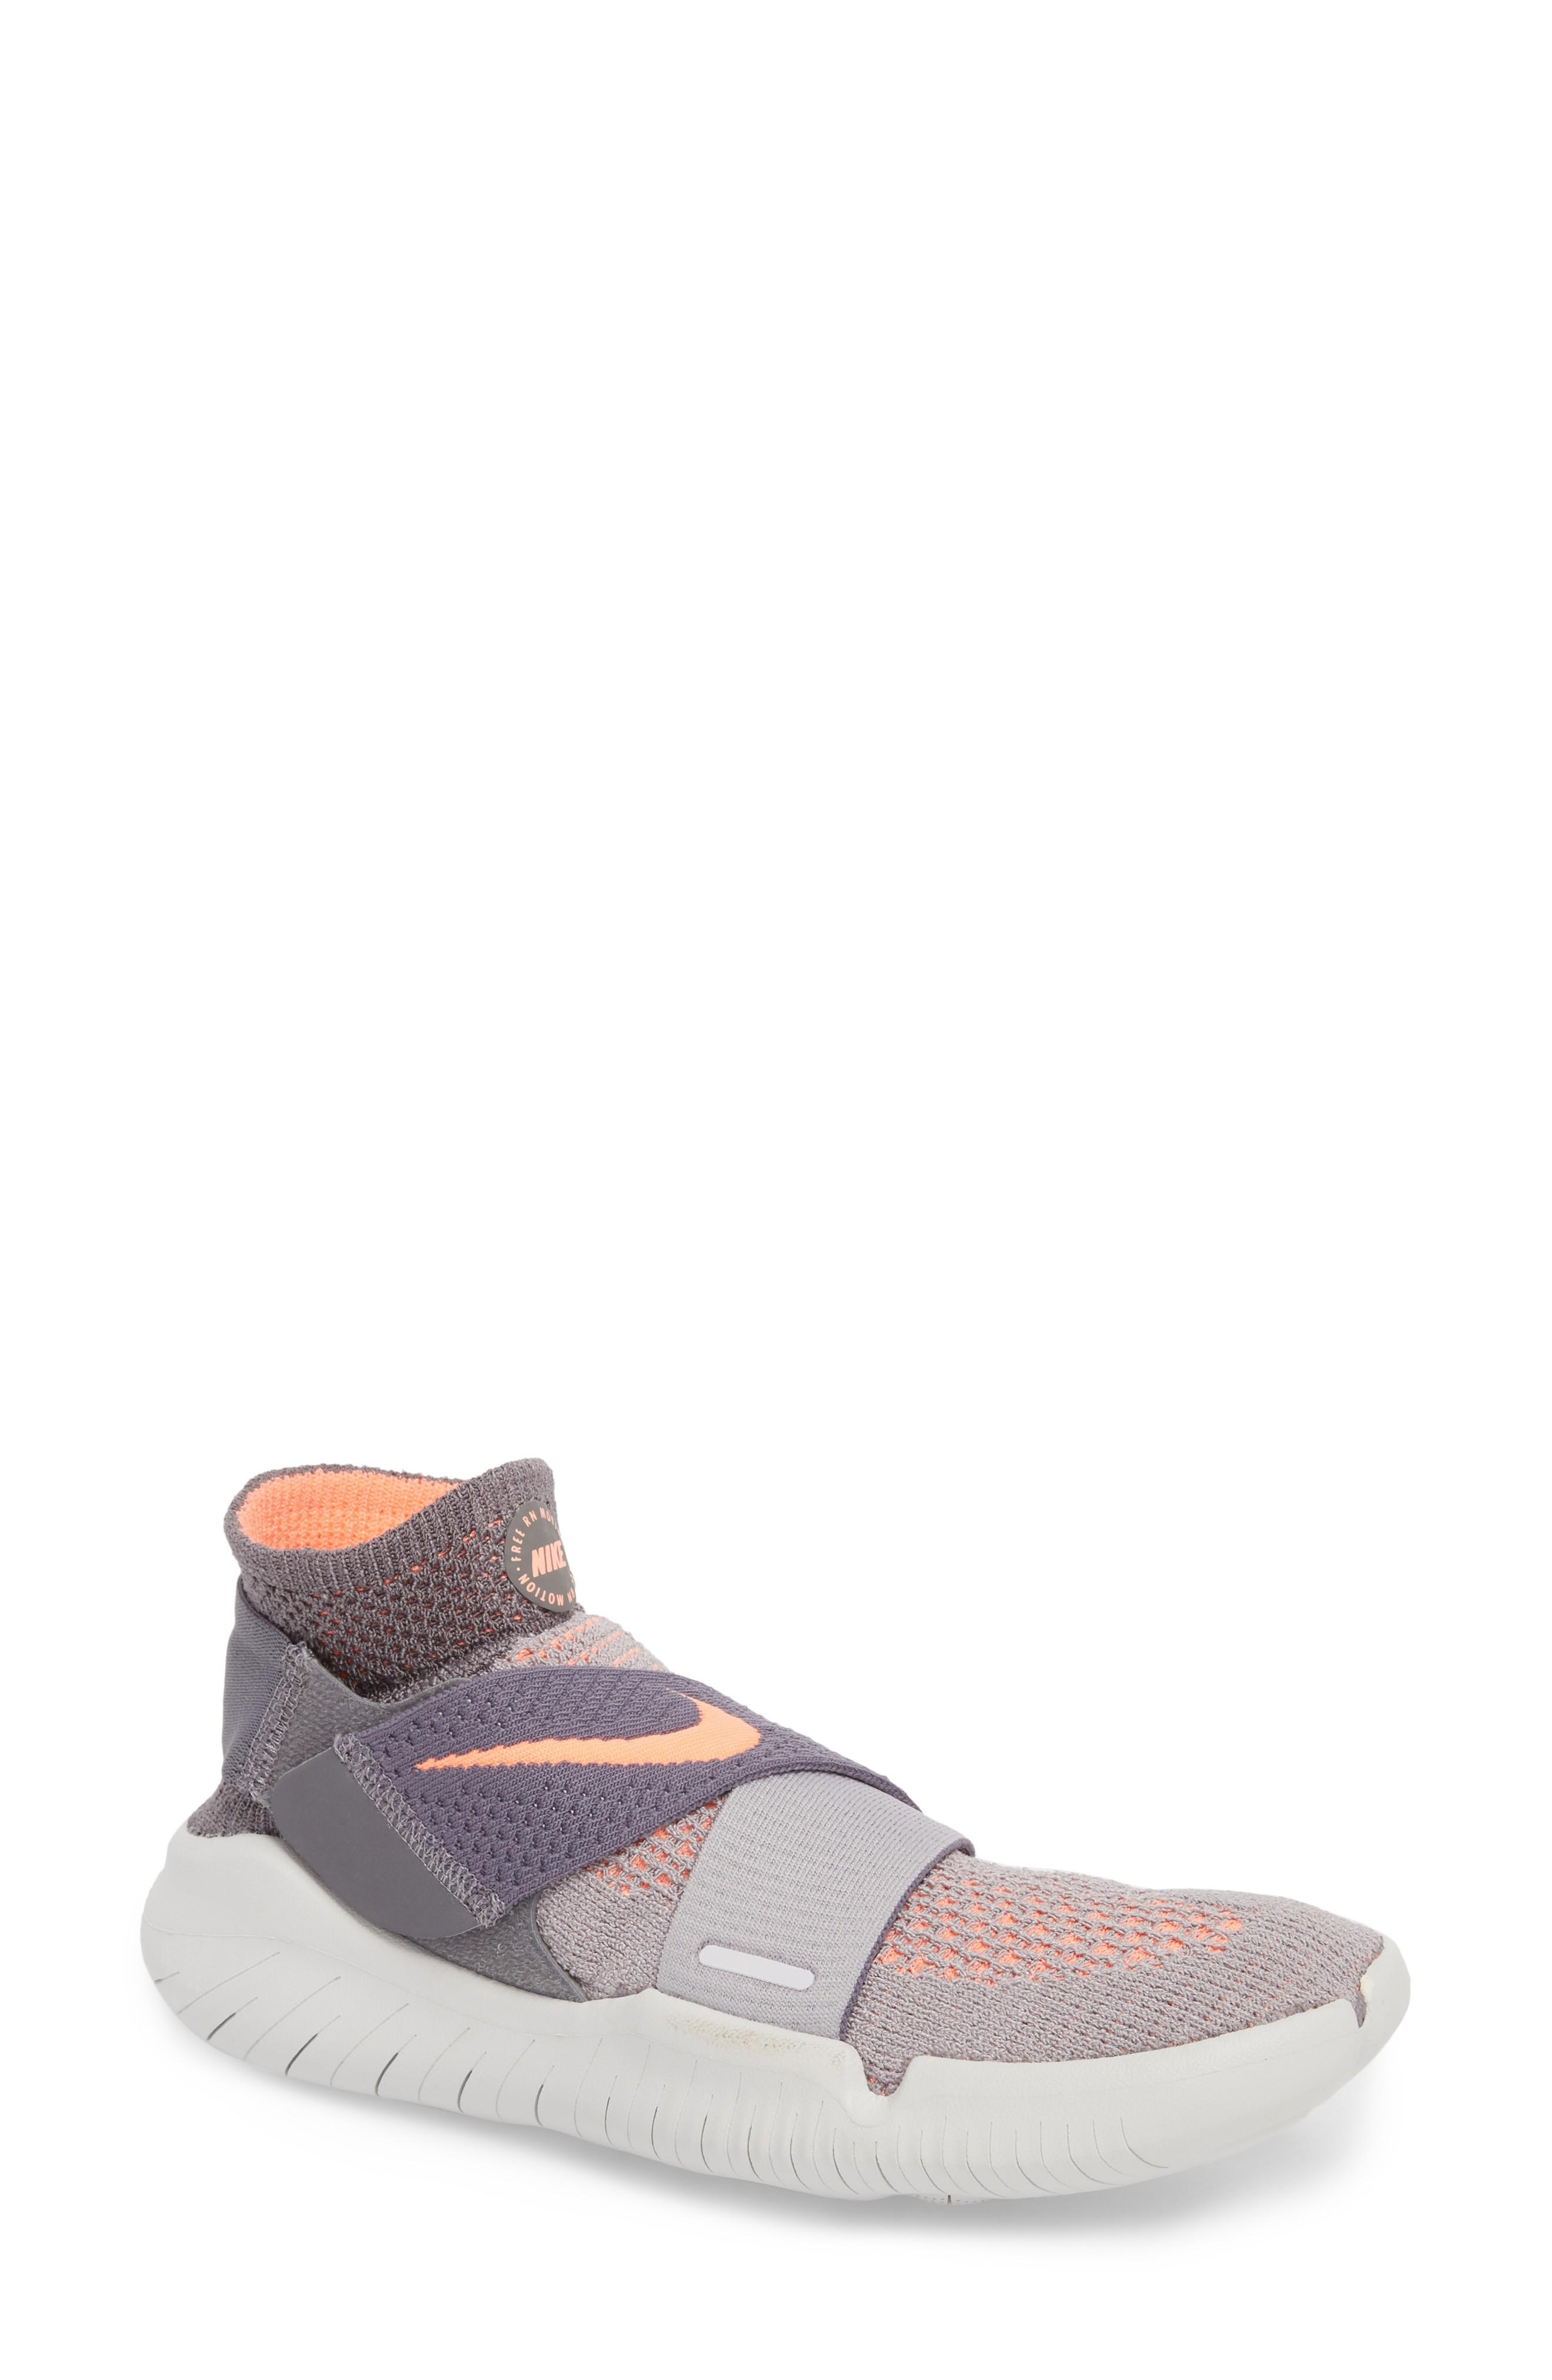 pivote Pies suaves emocionante  Nike Women's Free Rn Motion Flyknit 2018 Running Shoes, Grey | ModeSens